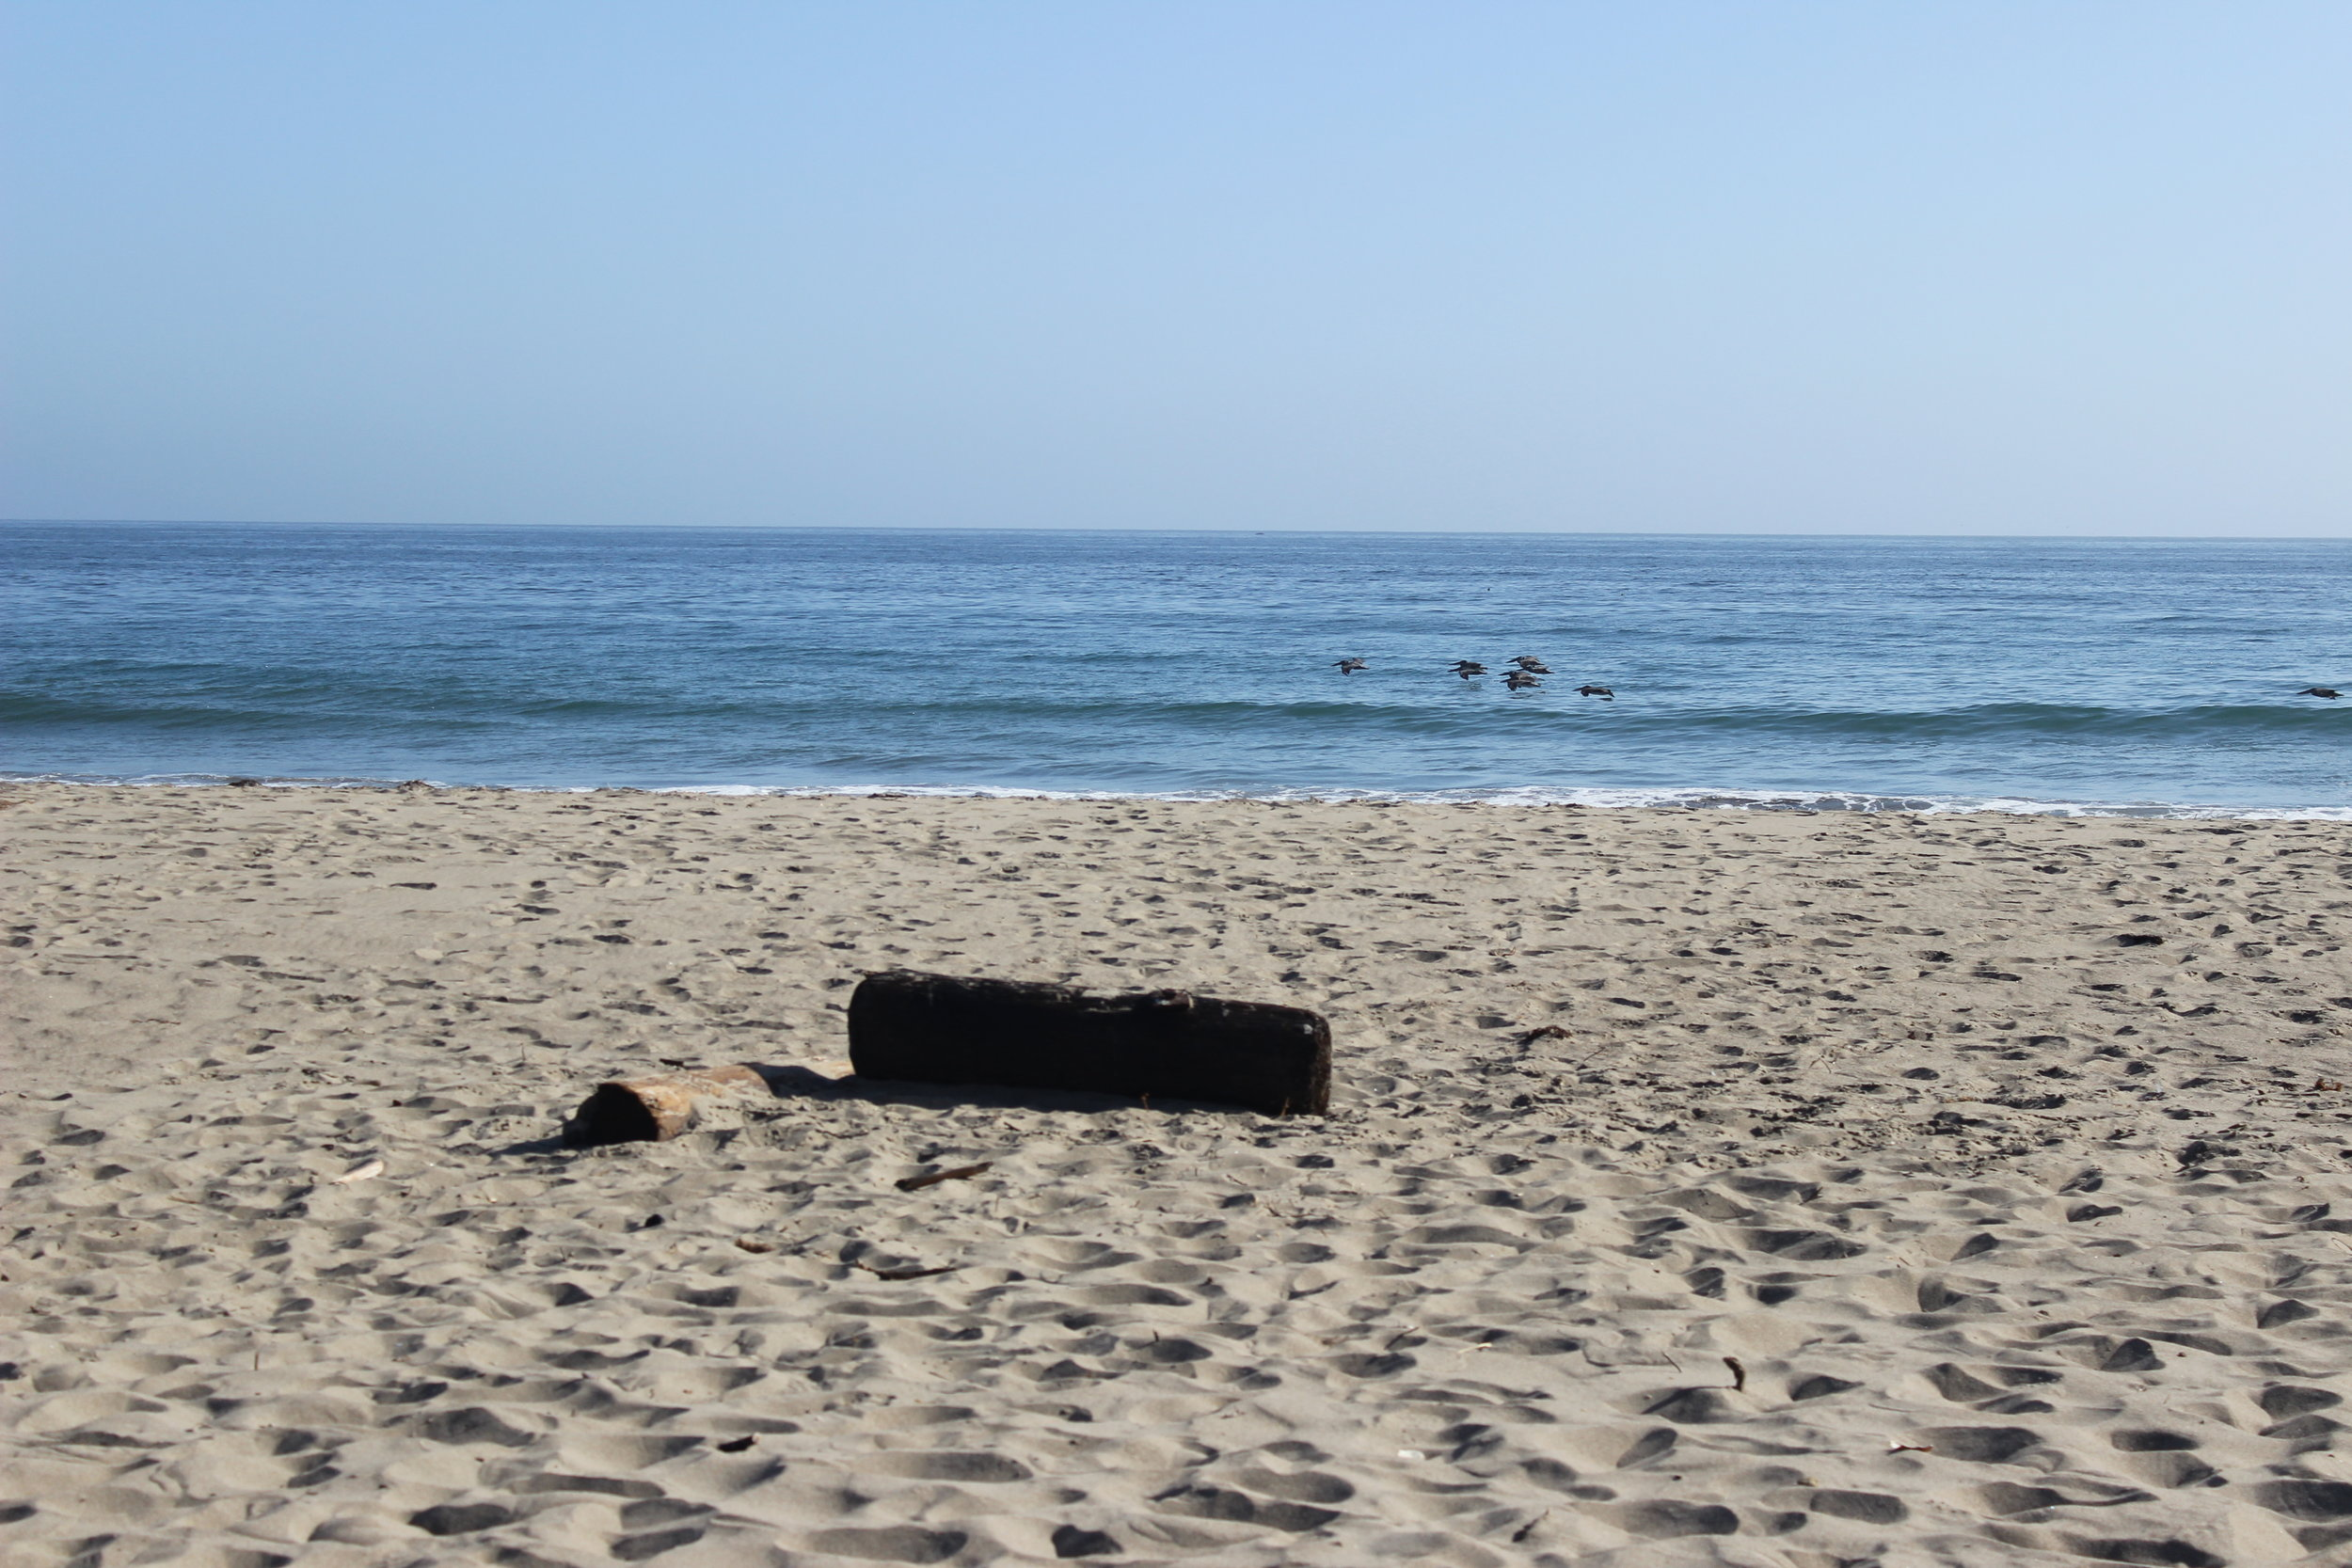 @Point Reyes National Seashore